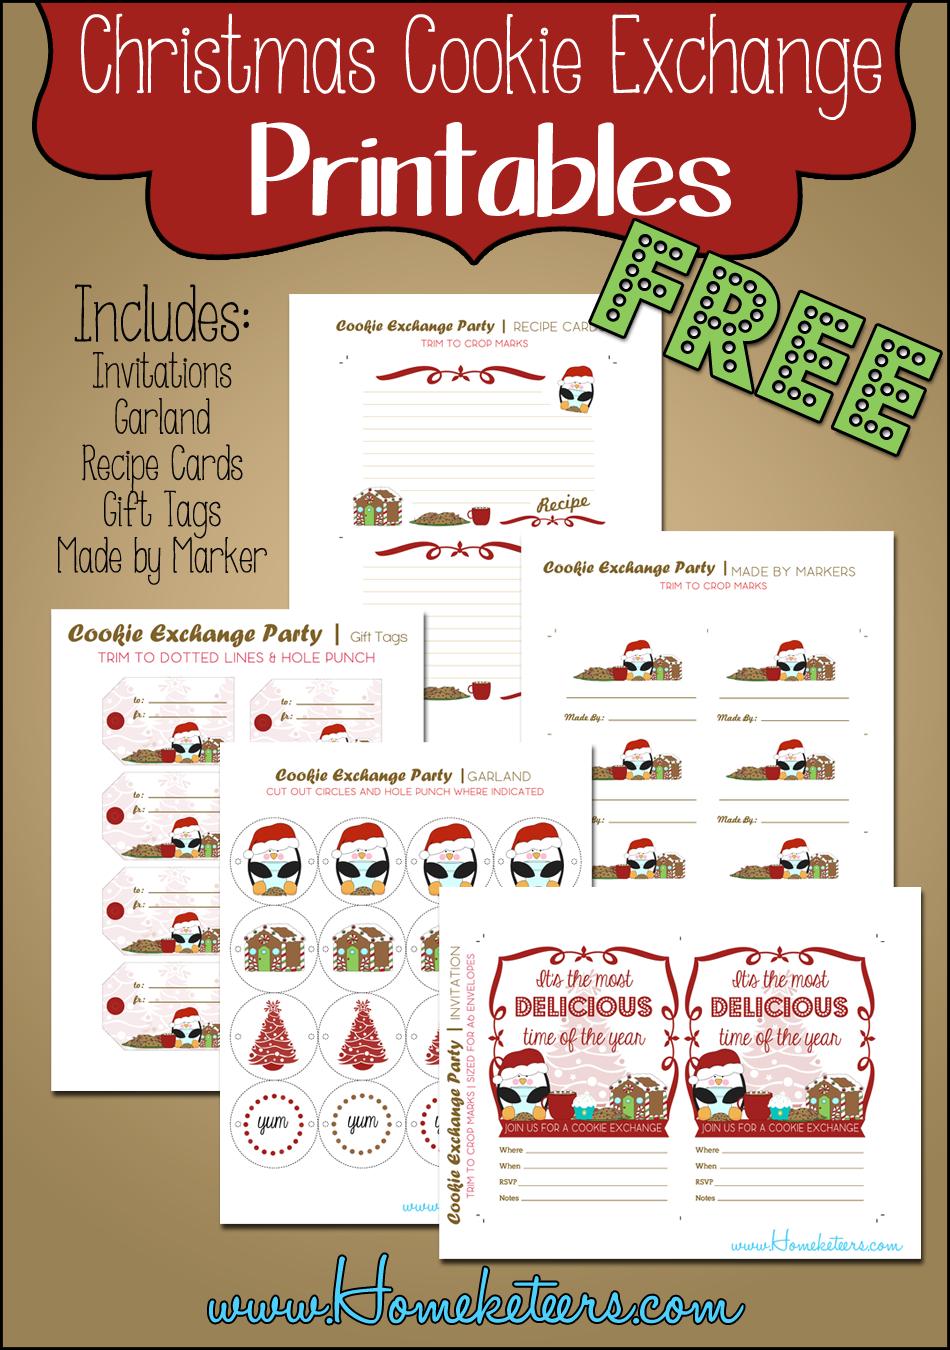 Christmas Cookie Exchange ~ Free Printables | Avec Amour, Fait - Free Christmas Cookie Exchange Printable Invitation